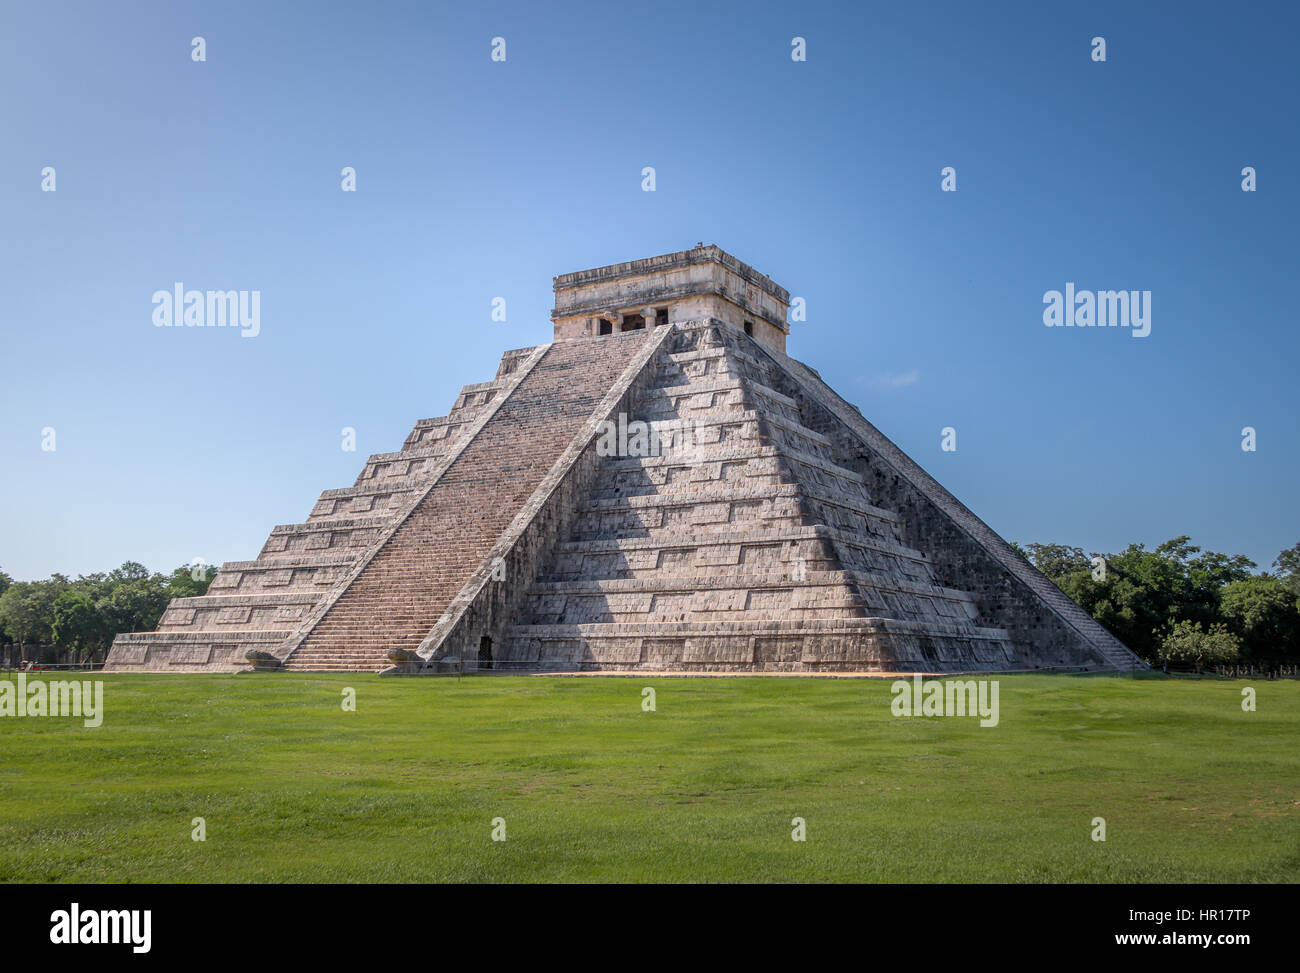 Tempel der Maya Pyramide des Kukulkan - Chichen Itza, Yucatan, Mexiko Stockbild